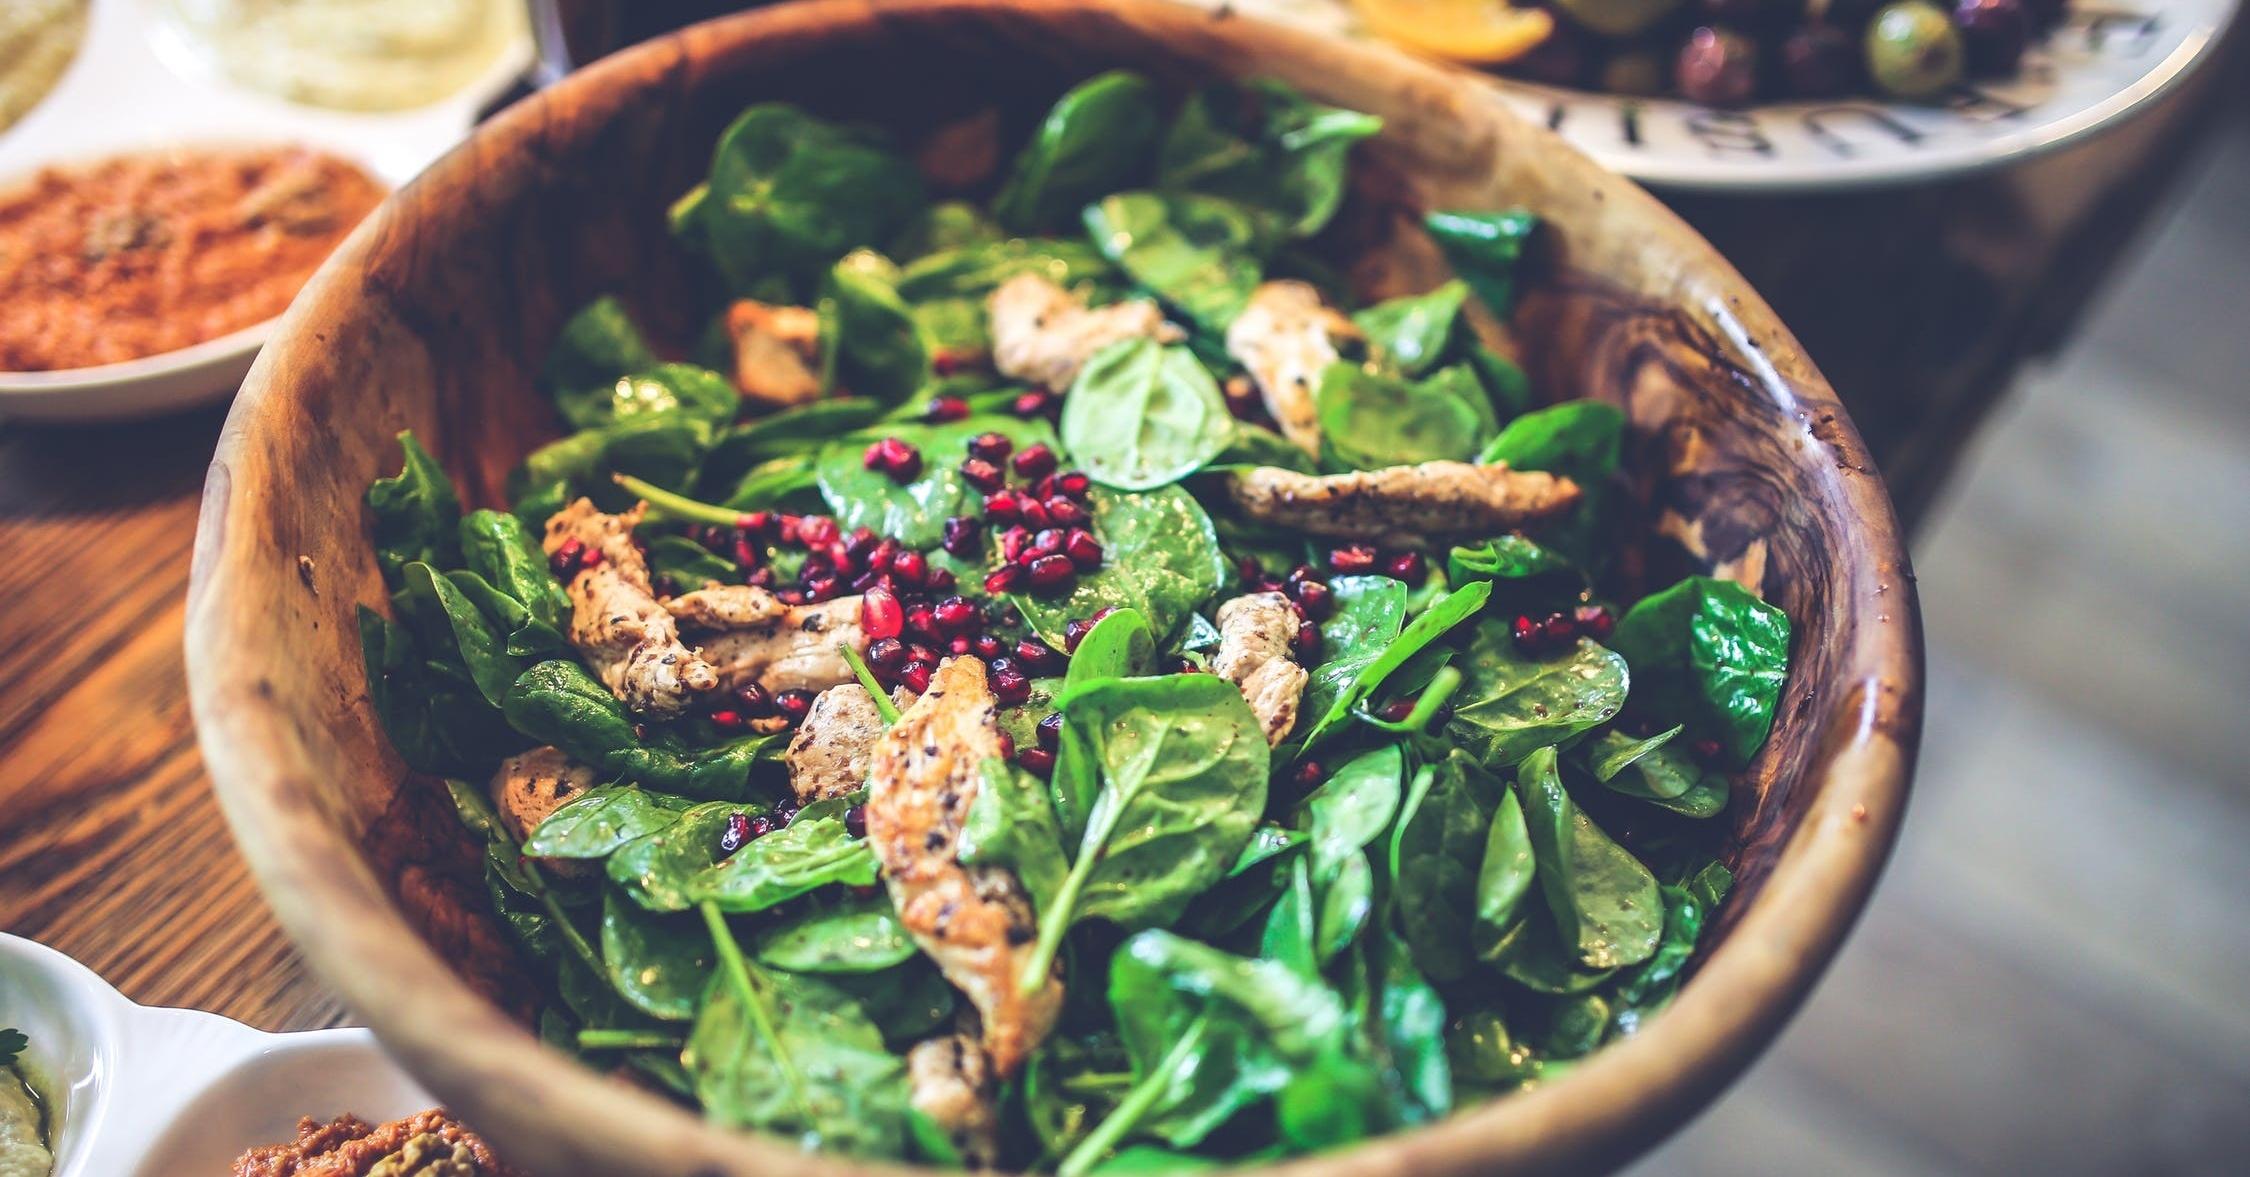 Go Pegan – So geht der Ernährungstrend